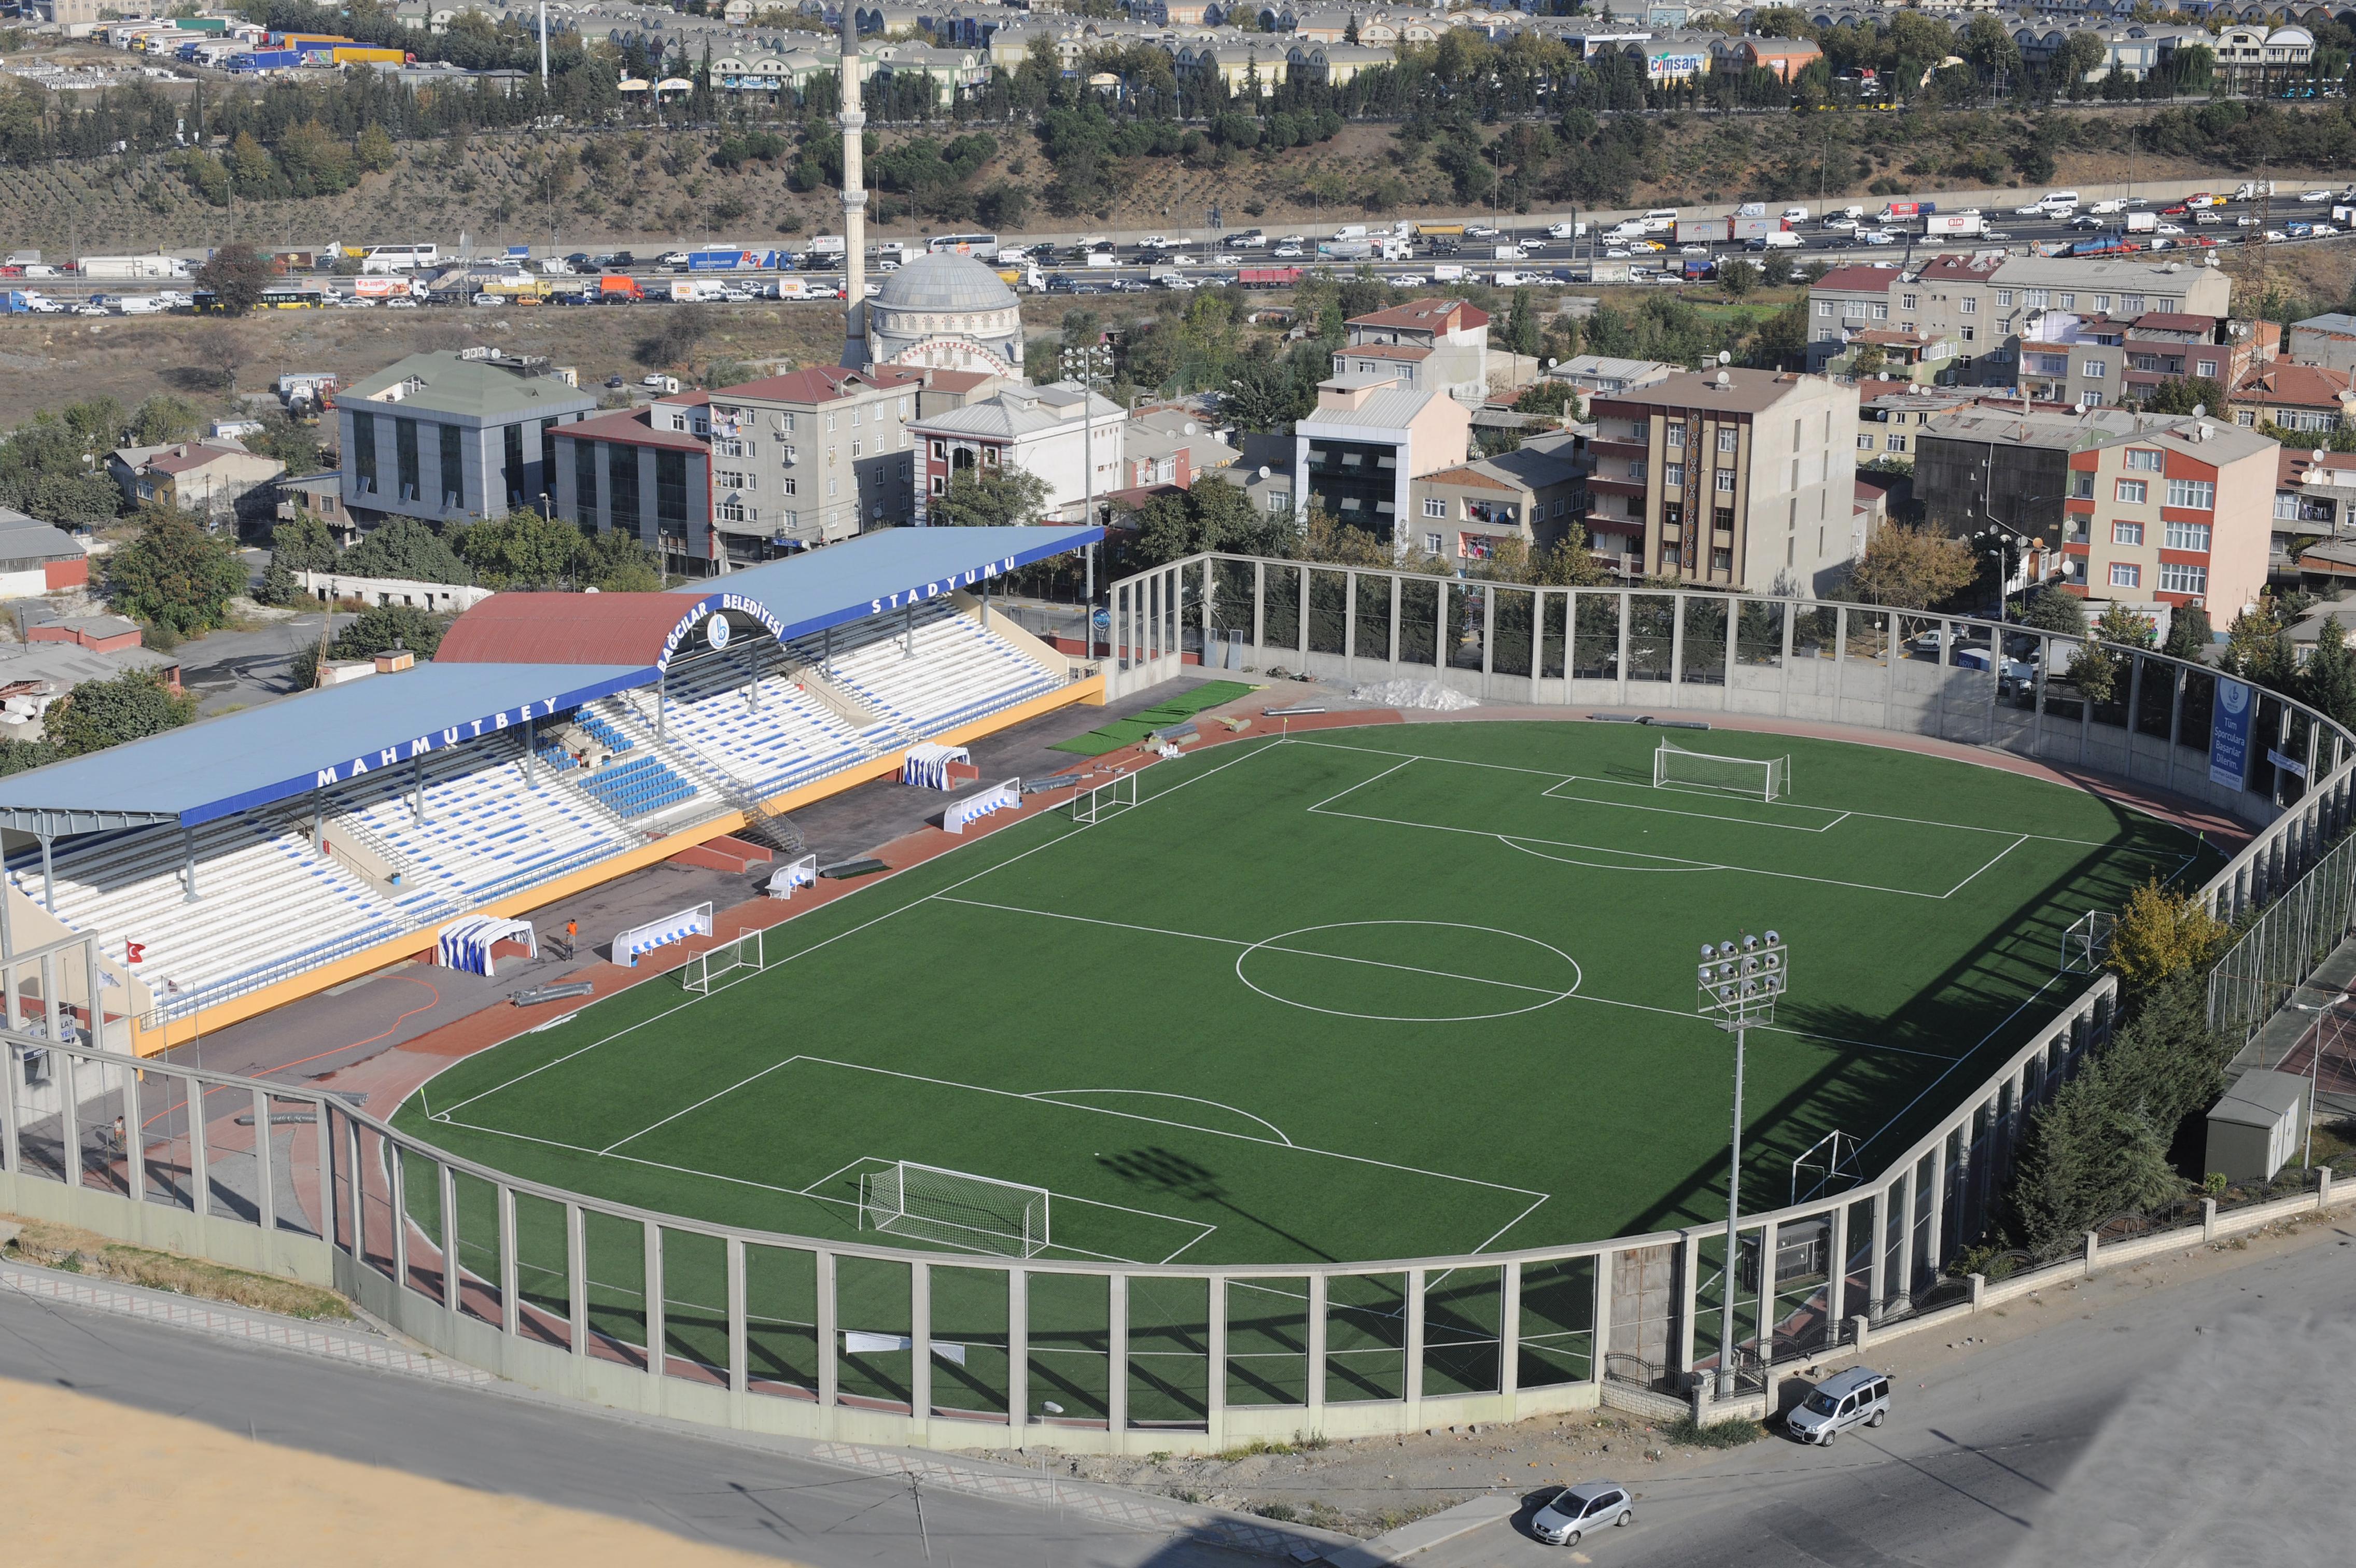 Belediye Stadyumu ( Mahmutbey Stadyumu )